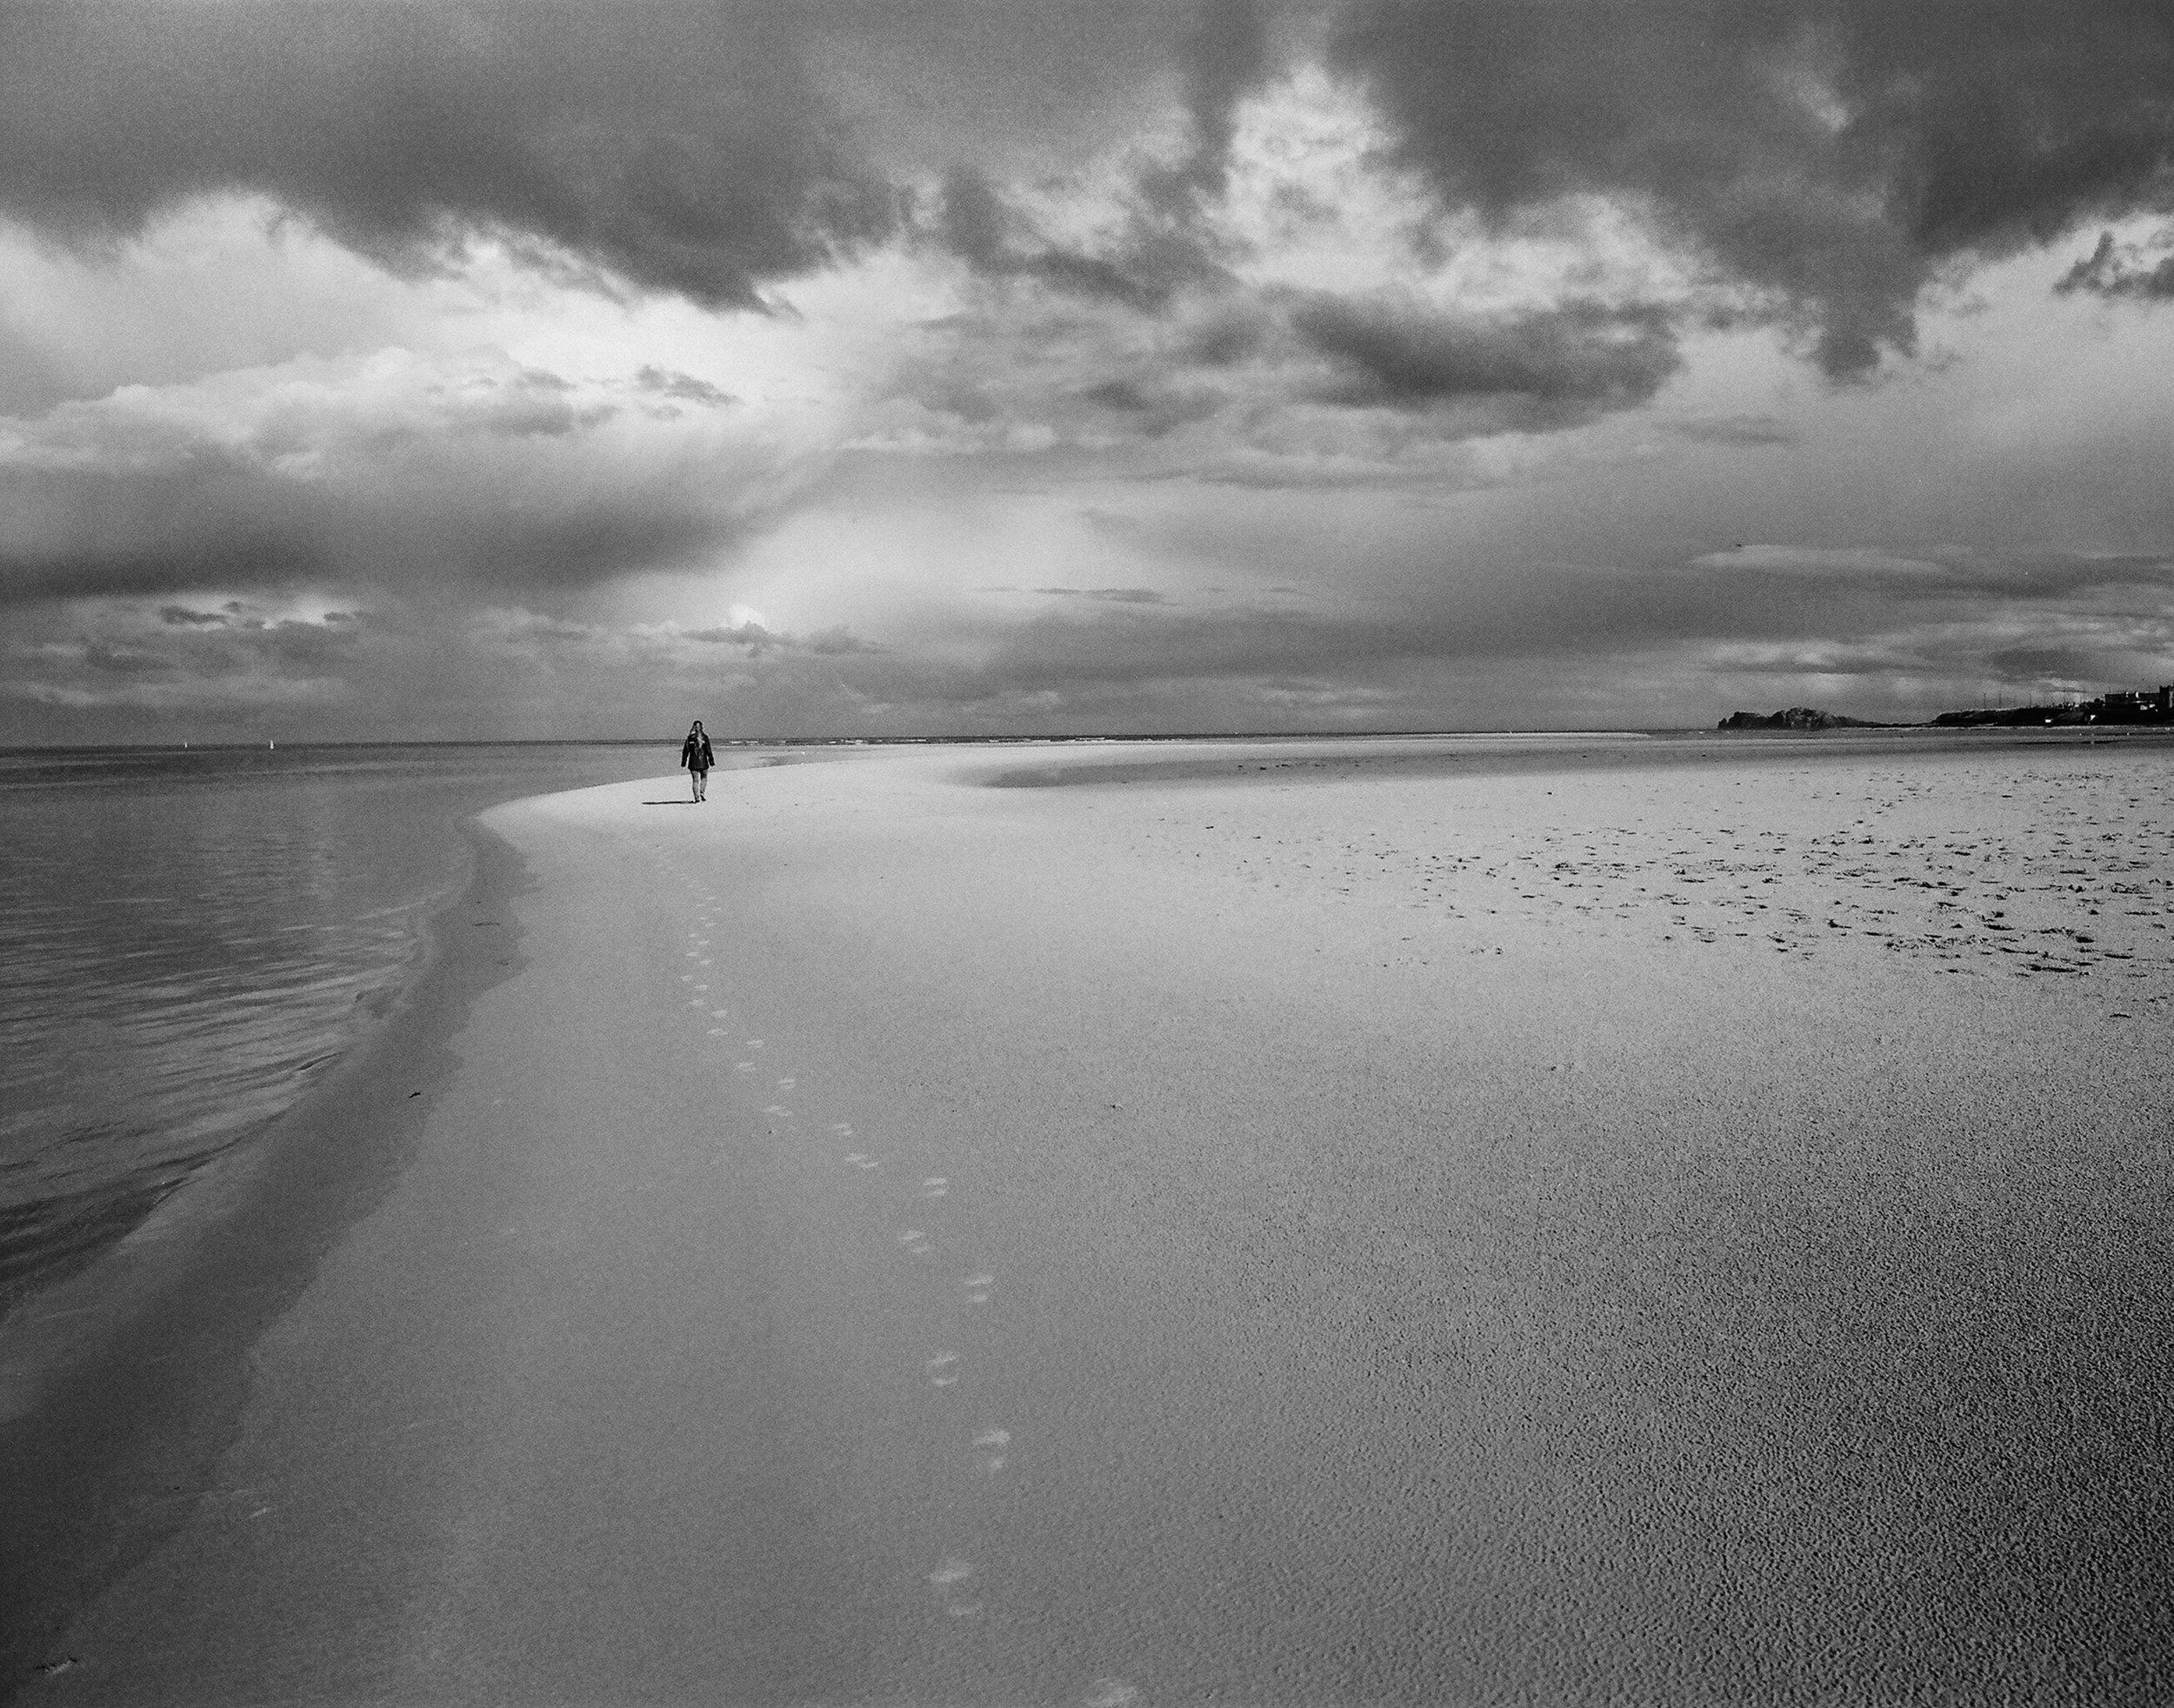 Alone At Malahide | Leica M6 | Ilford Delta 100 | Mike Ruble